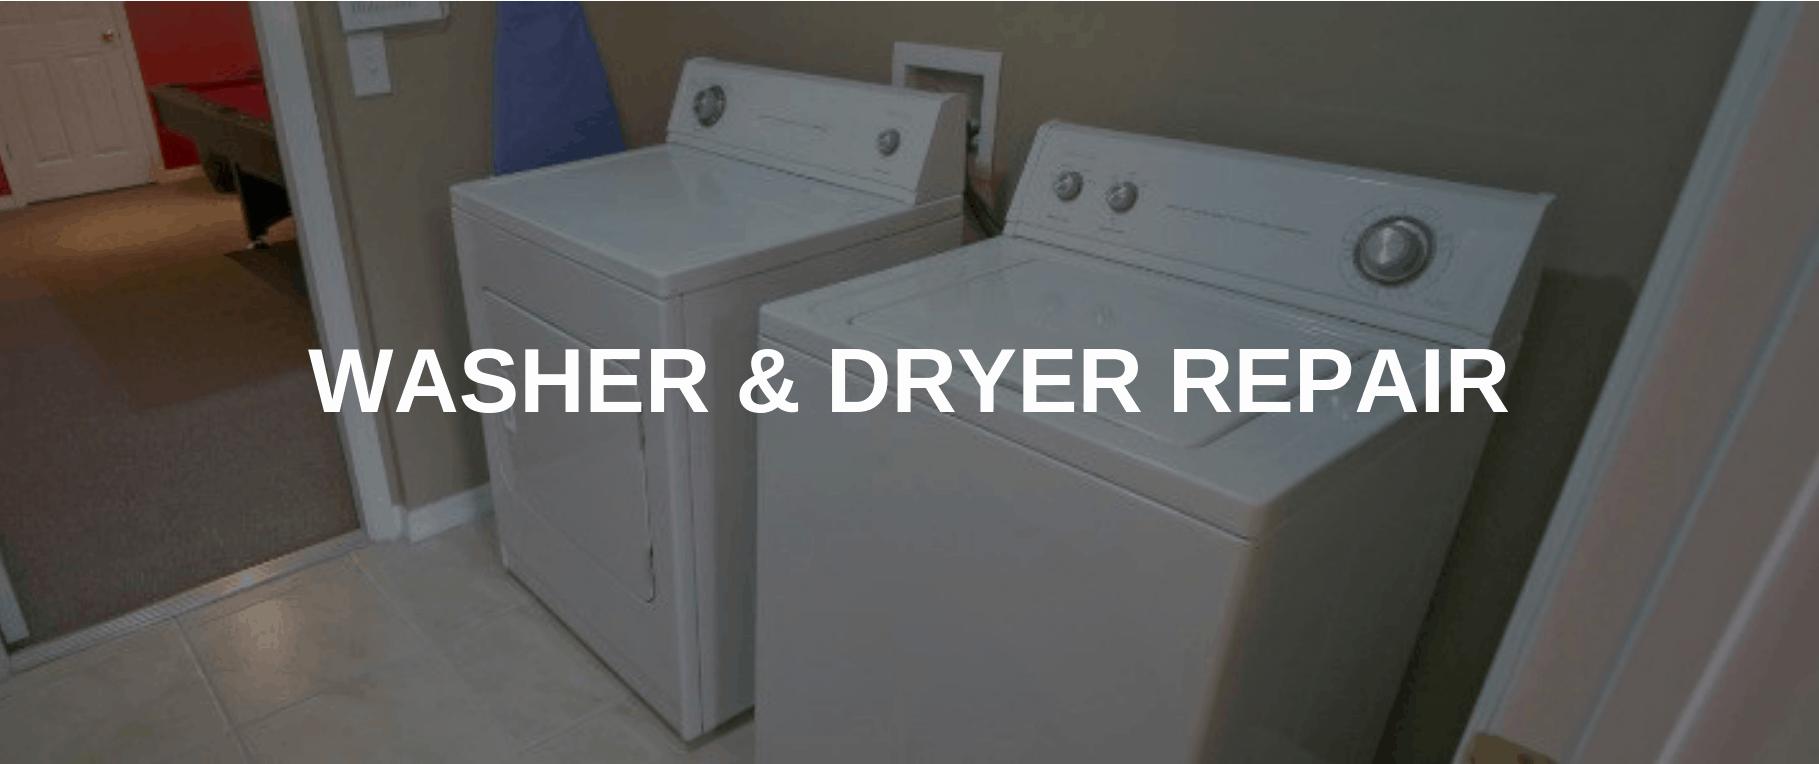 washing machine repair arlington